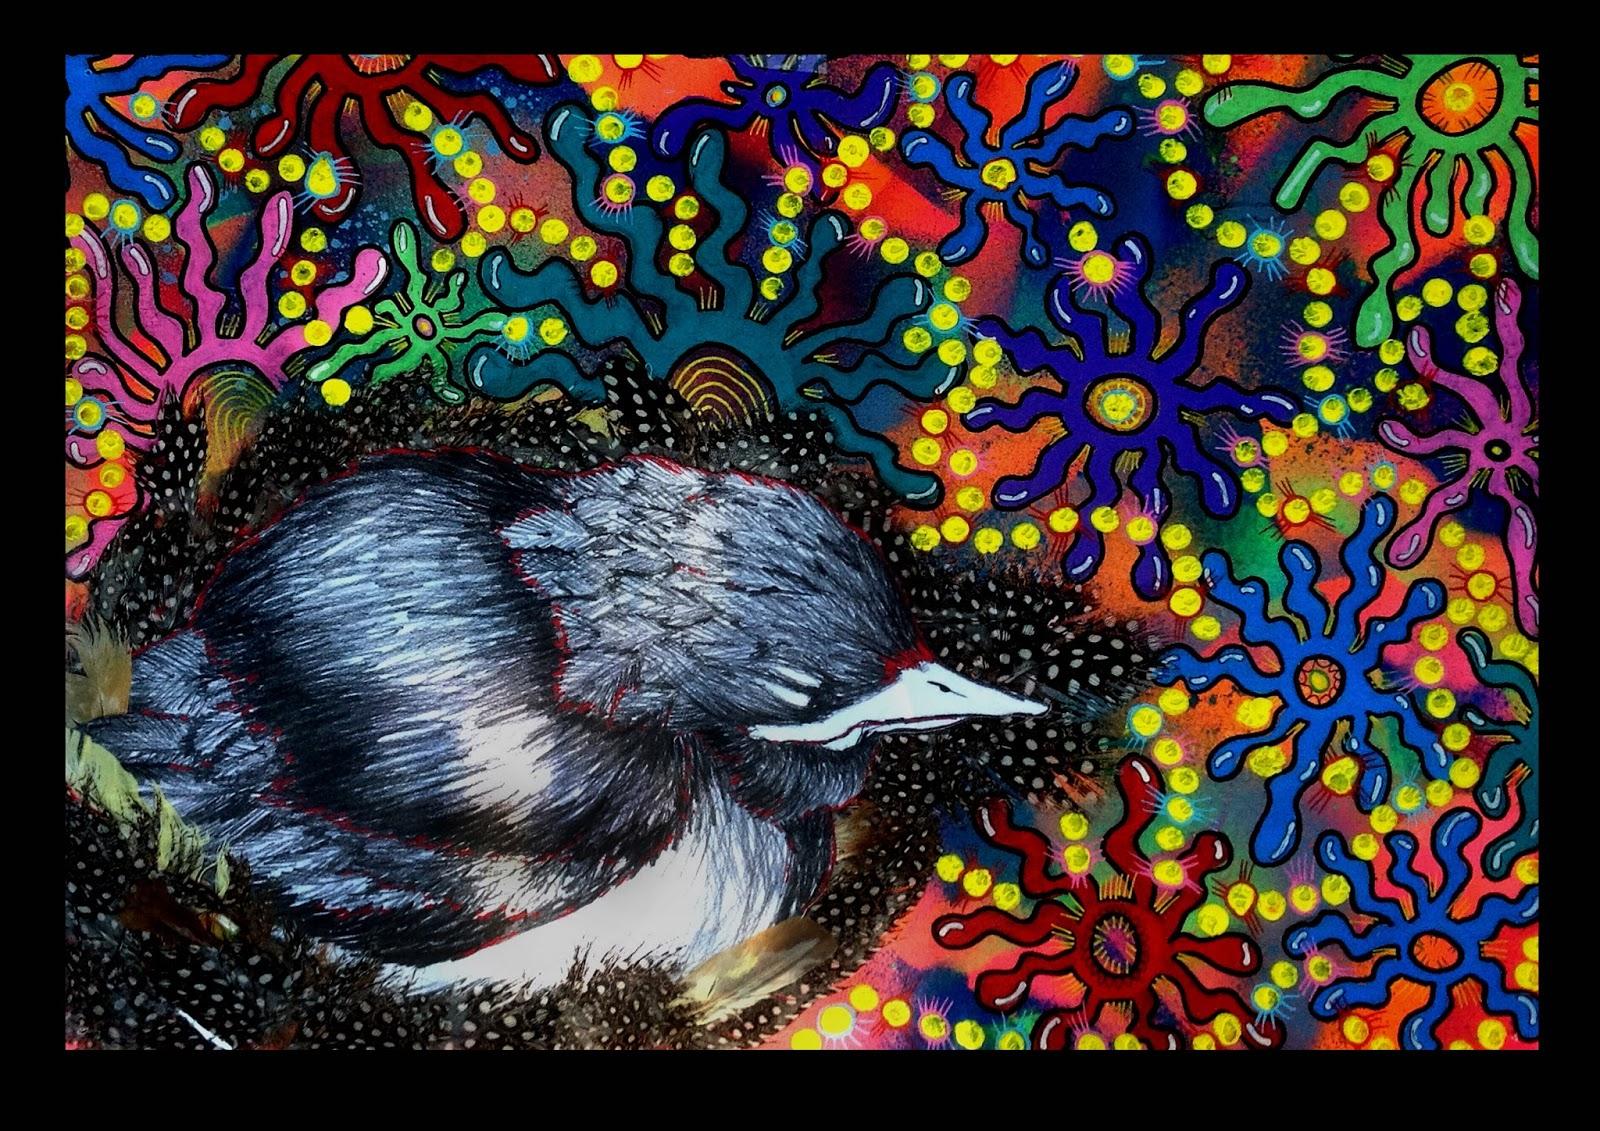 Australian Animals In Aboriginal Artworks